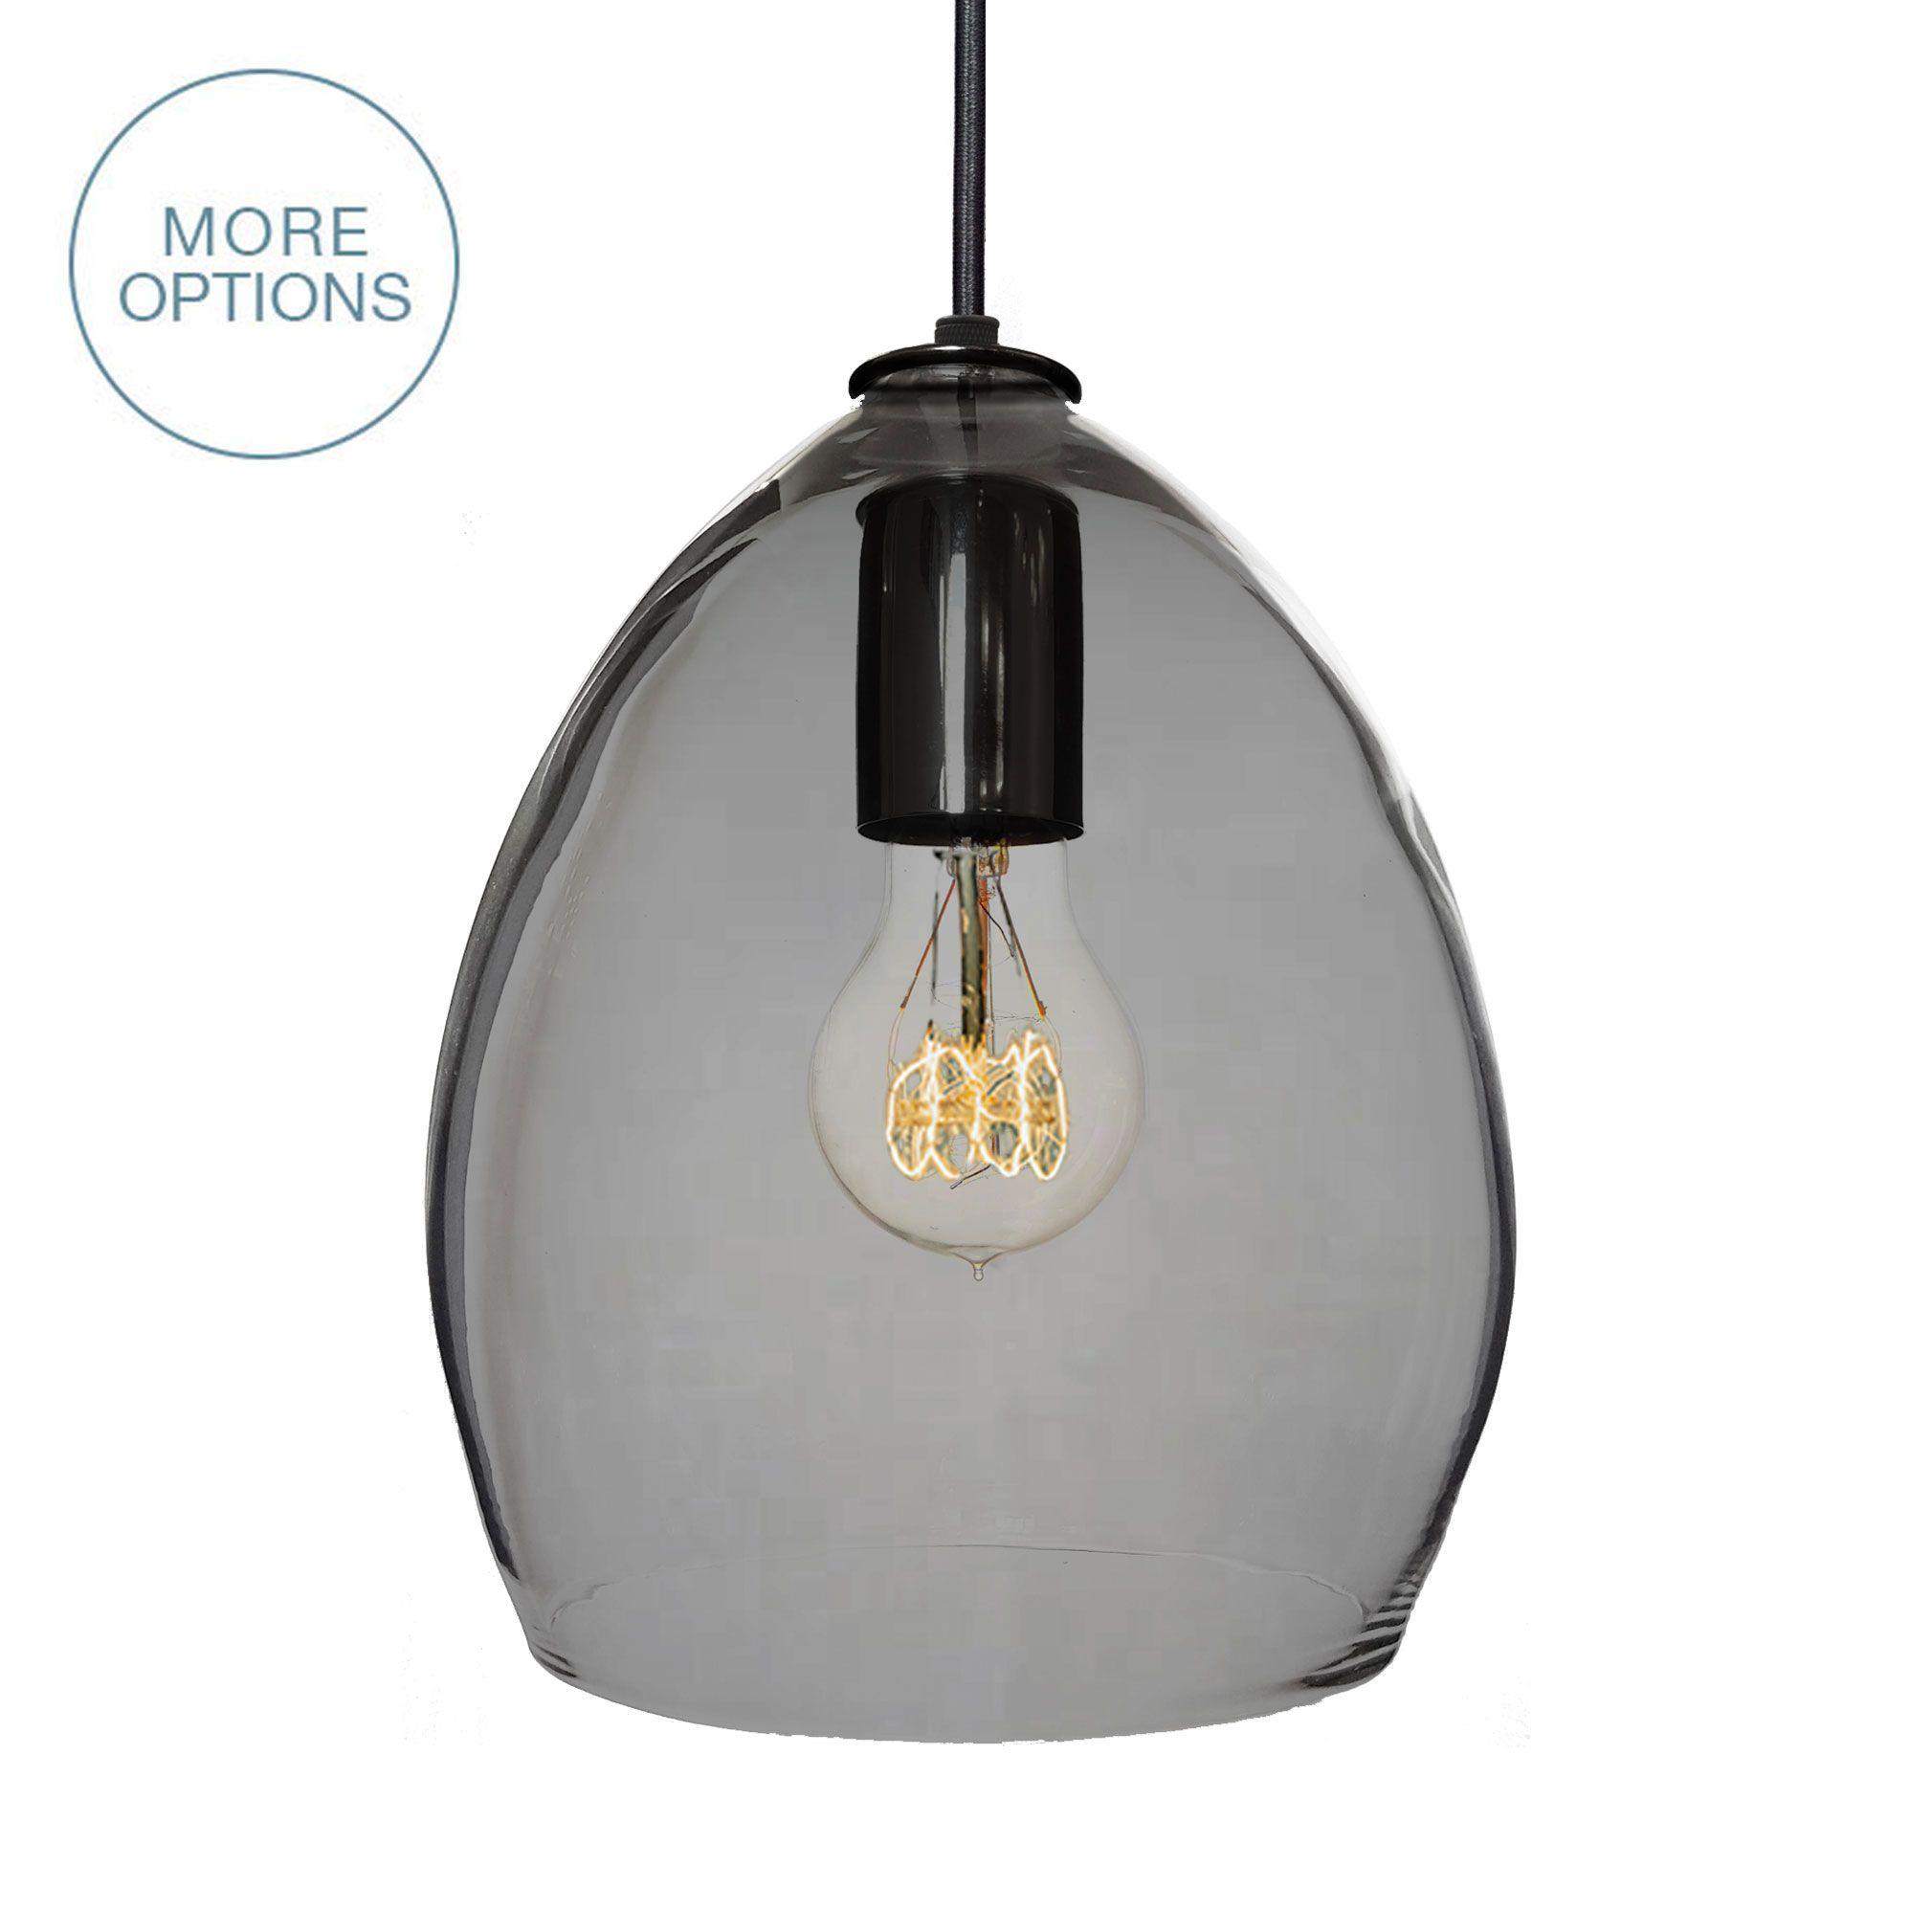 Glass Lighting Pendants Elegant Hand Blown Or Pendant: Custom Hand Blown Smoke Grey Glass Pendant Light By